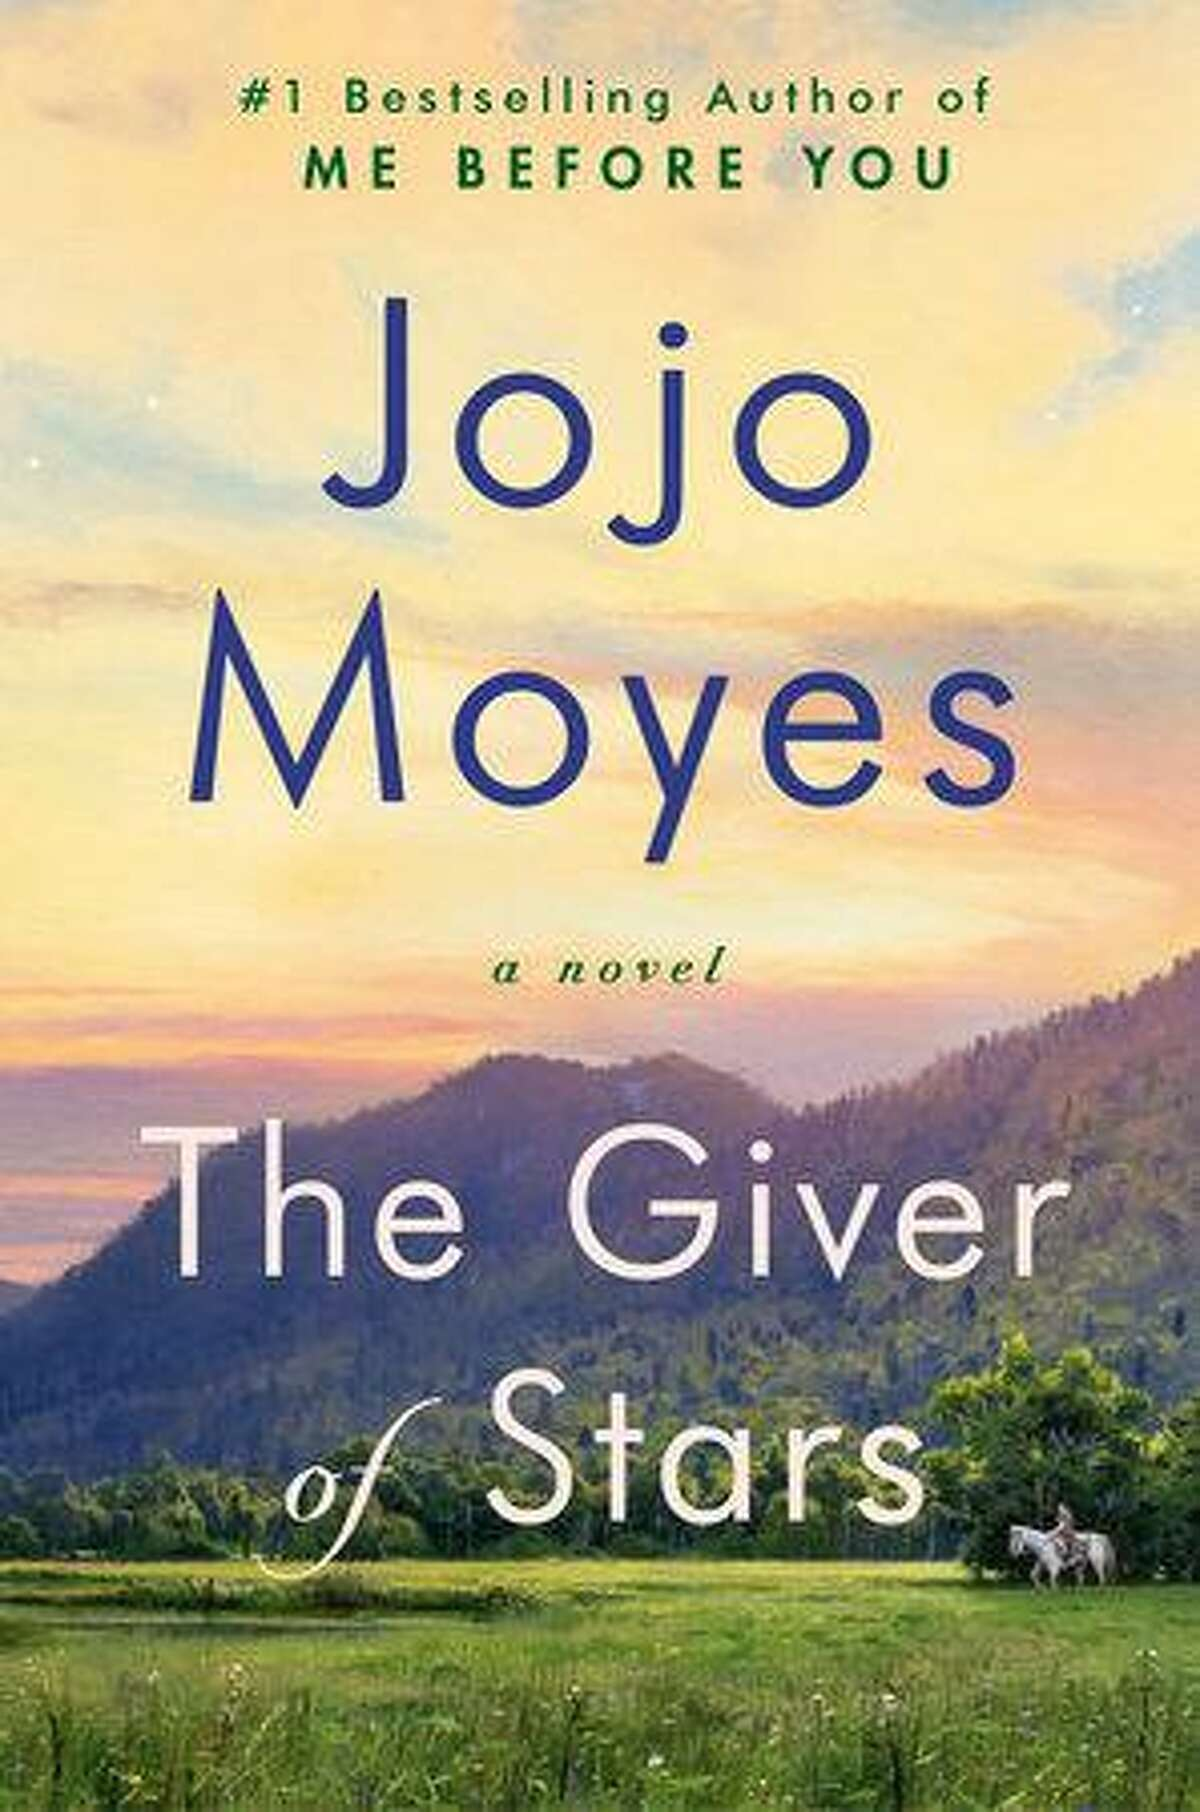 Jojo Moyes' latest novel